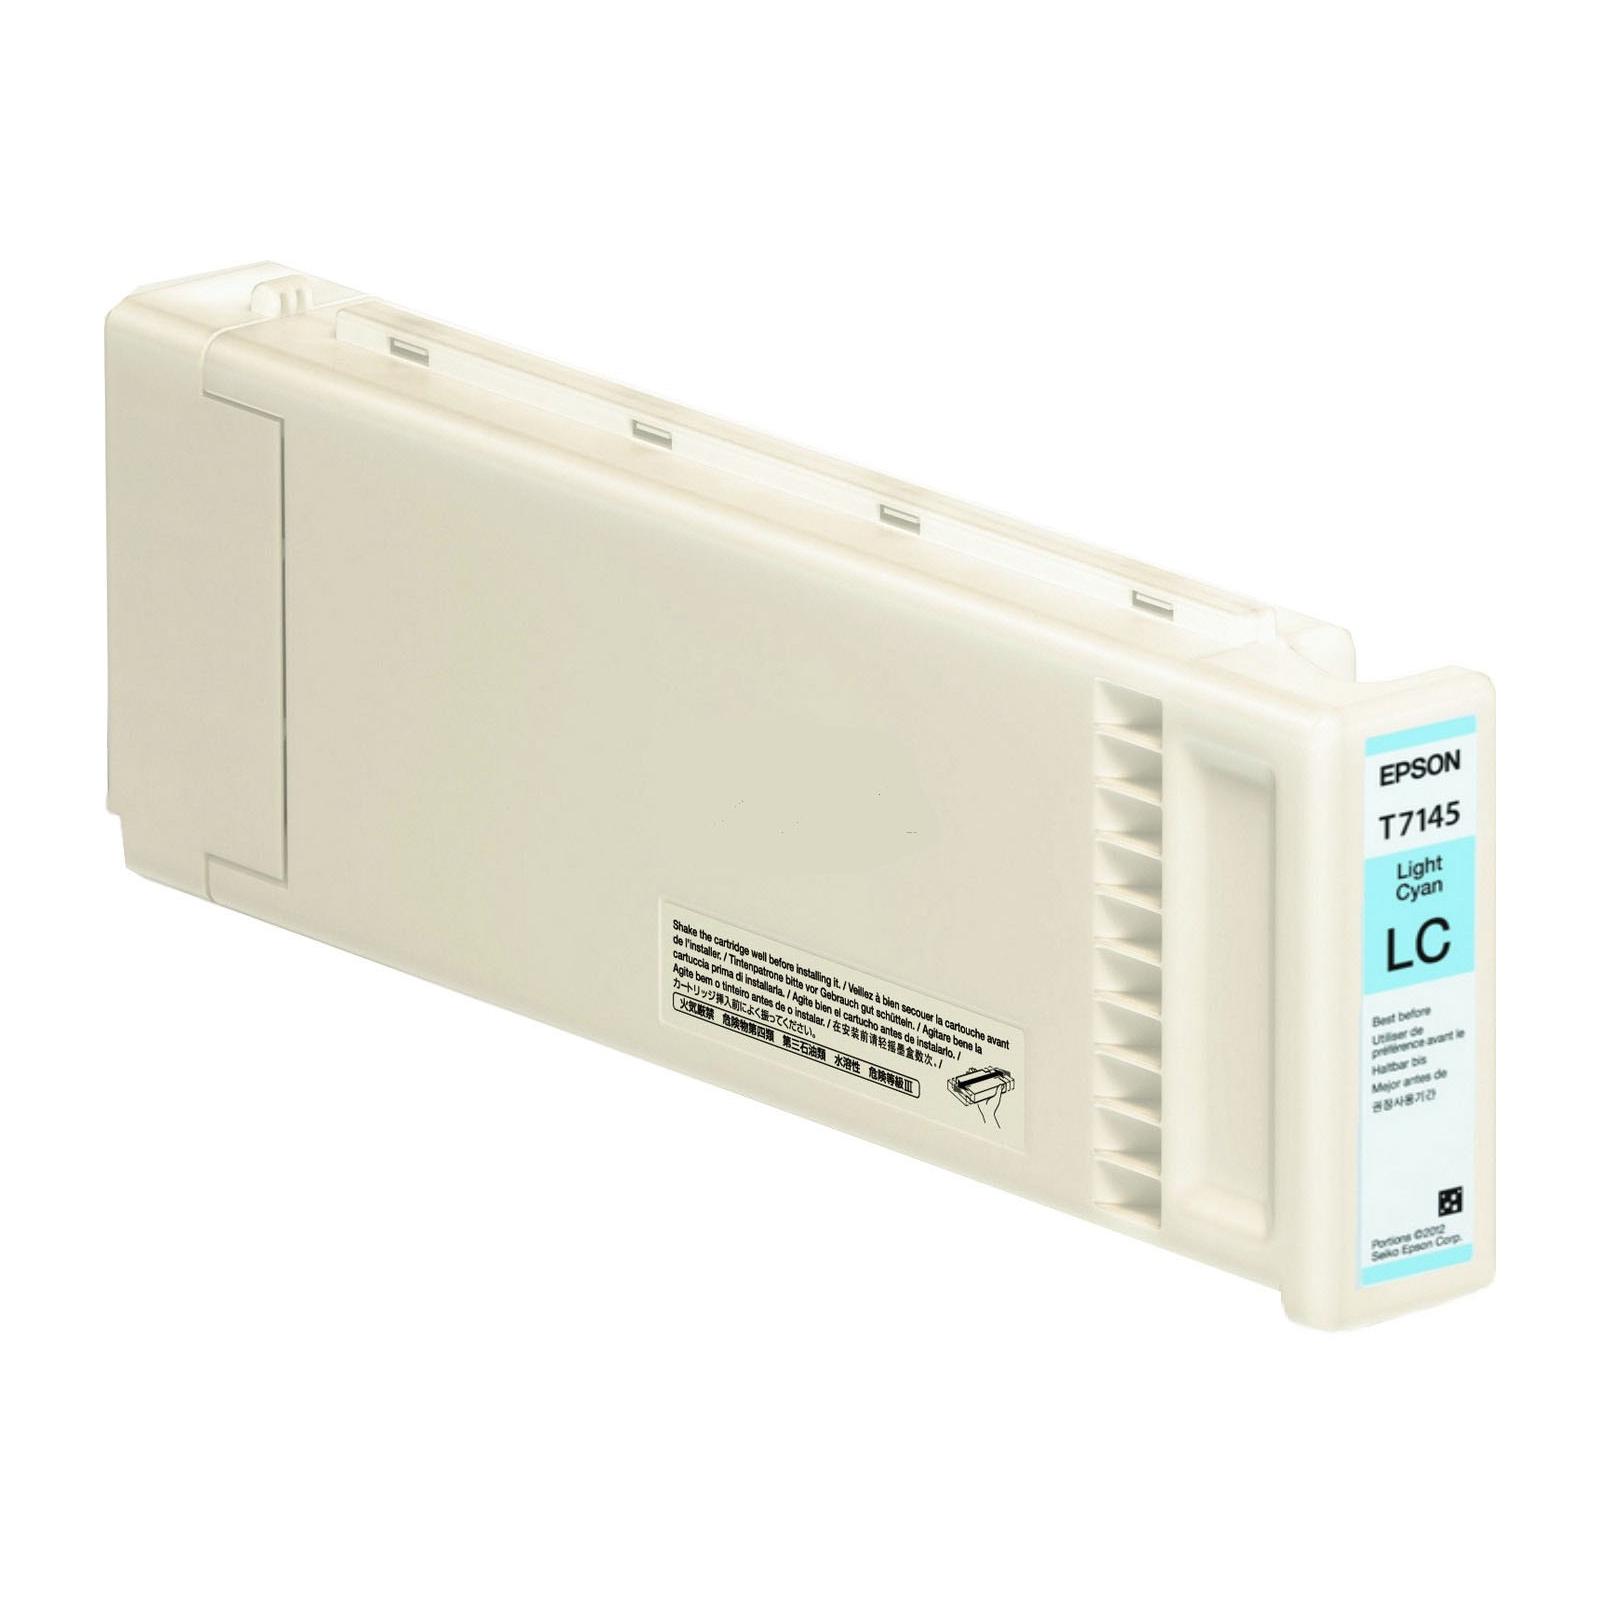 Картридж EPSON SureColor SC-S70610 Light cyan (C13T714500)